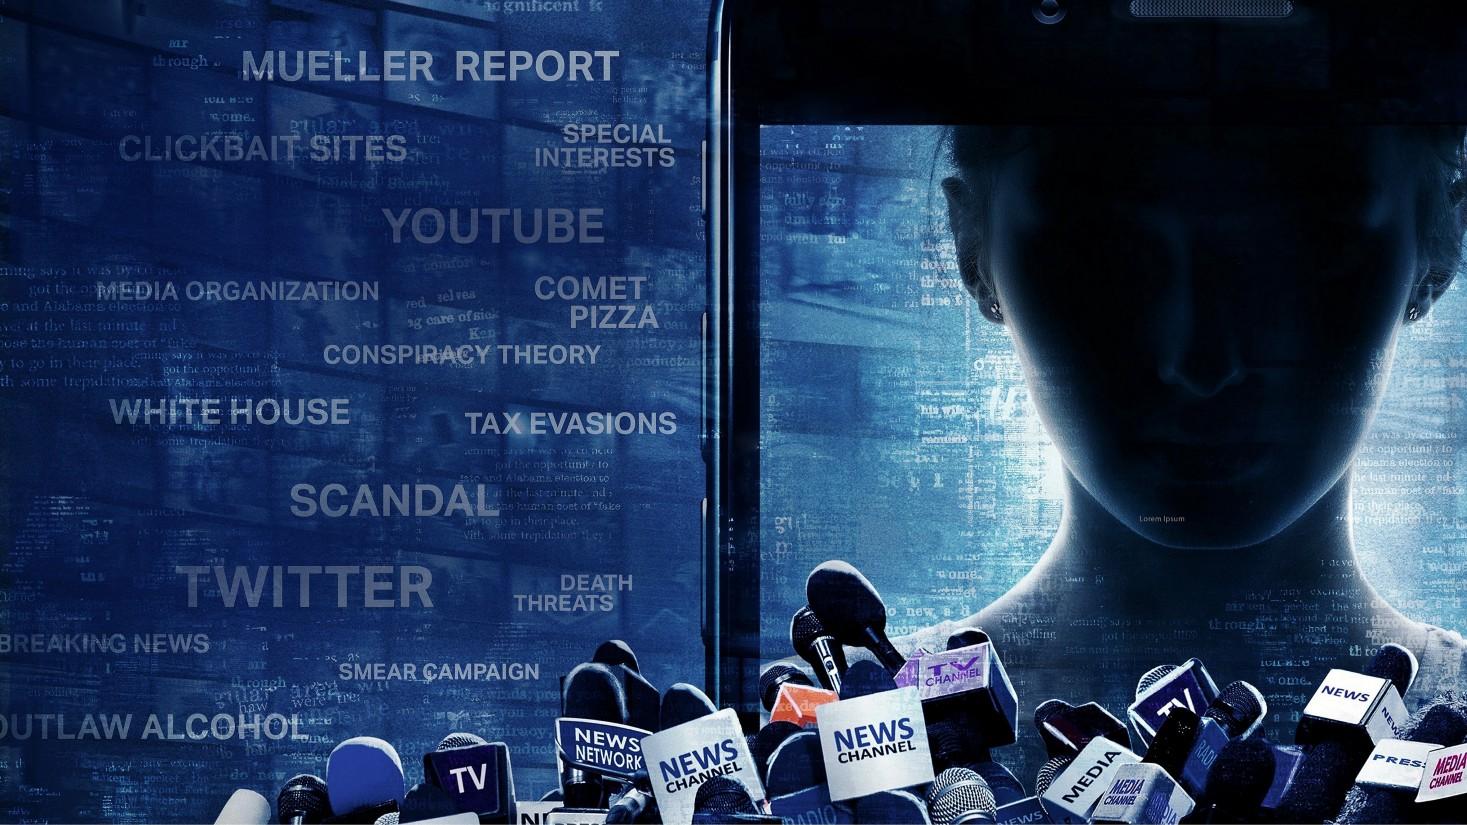 After TruthDisinformation and the Cost of Fake News روزیاتو: مروری بر بهترین فیلم های مستند سال ۲۰۲۰ اخبار IT